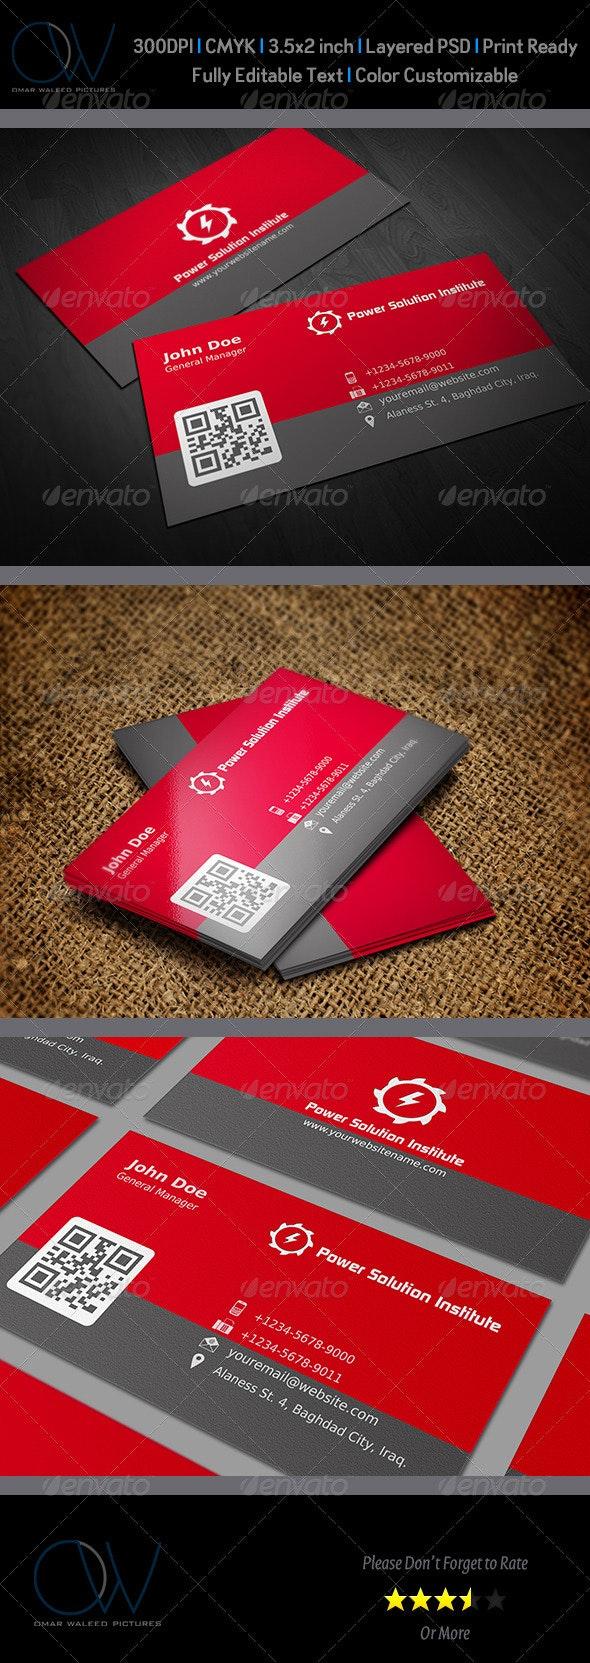 Corporate Business Card Vol.6 - Corporate Business Cards